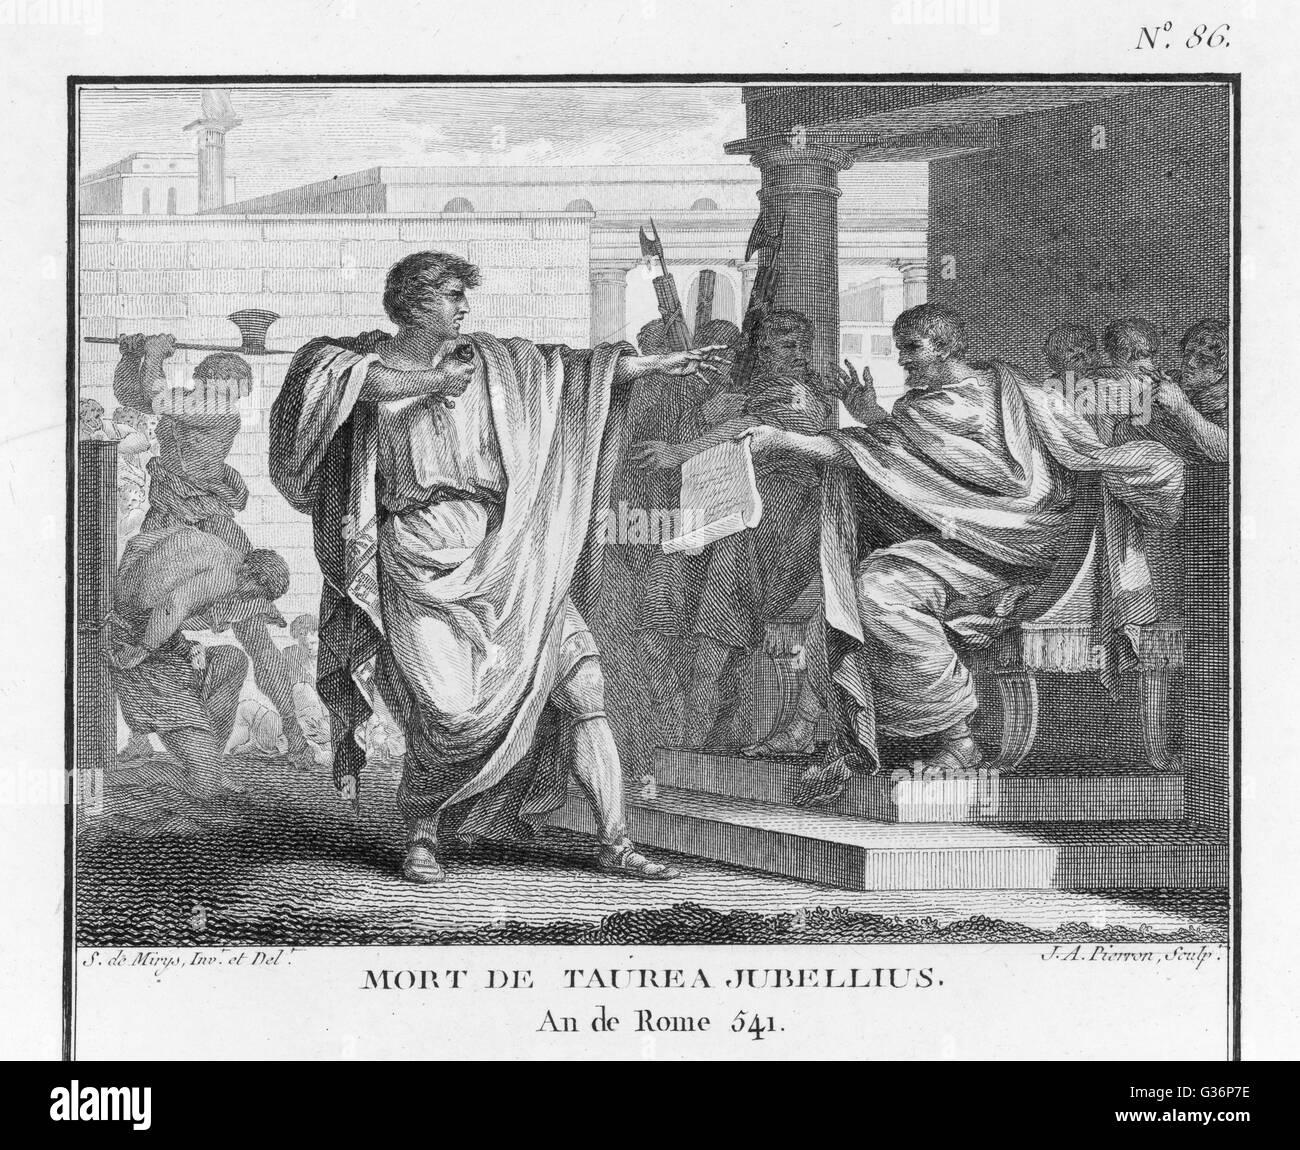 Morte di Taurea Jubellius, dipinto di Jean-Jacques Lagrenée